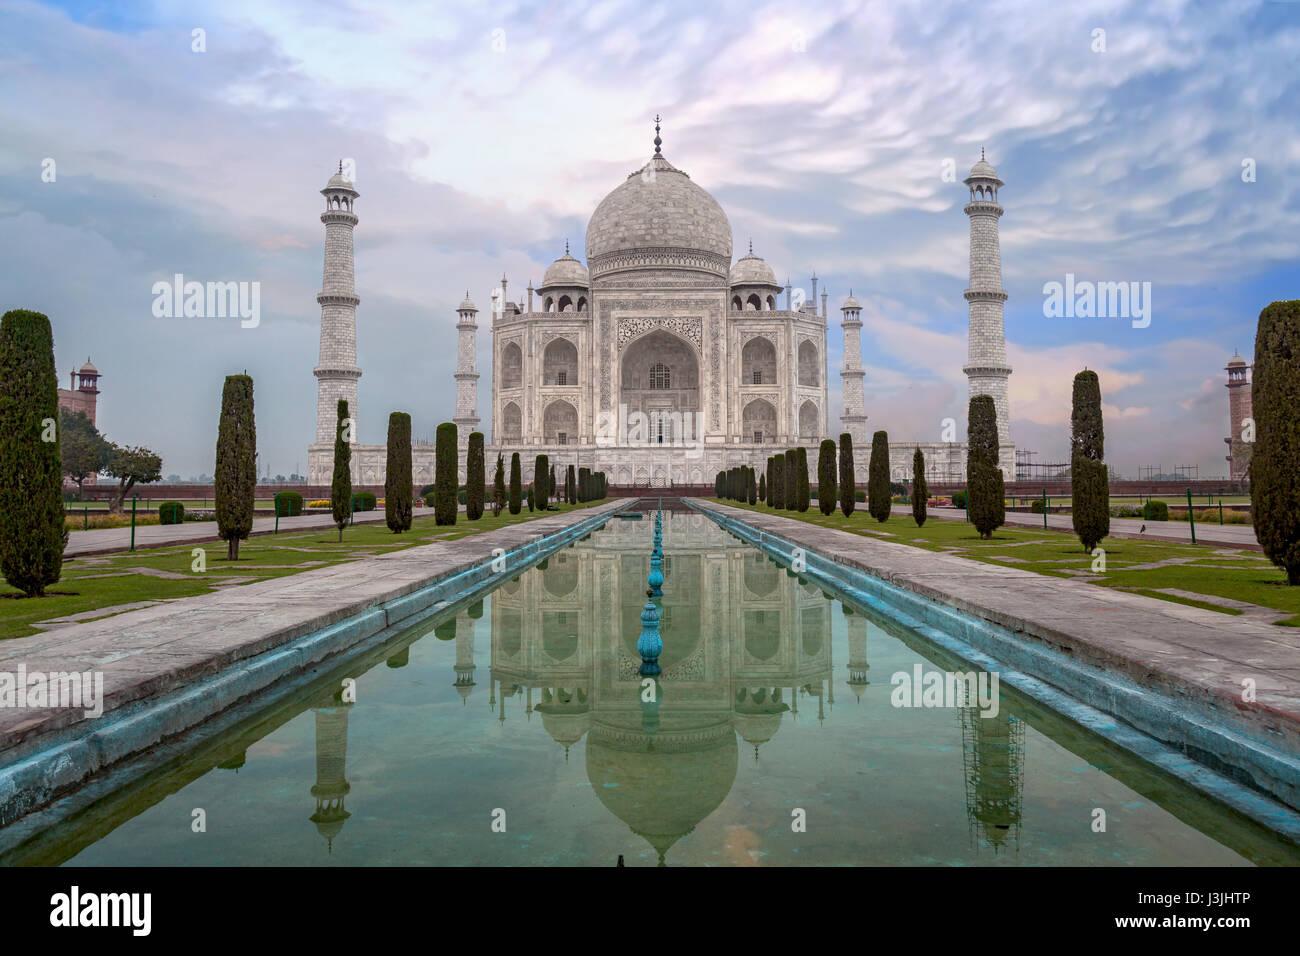 Taj Mahal bei Sonnenaufgang. Taj Mahal ist ein weißer Marmor-Mausoleum in Agra, die als UNESCO-Weltkulturerbe Stockbild